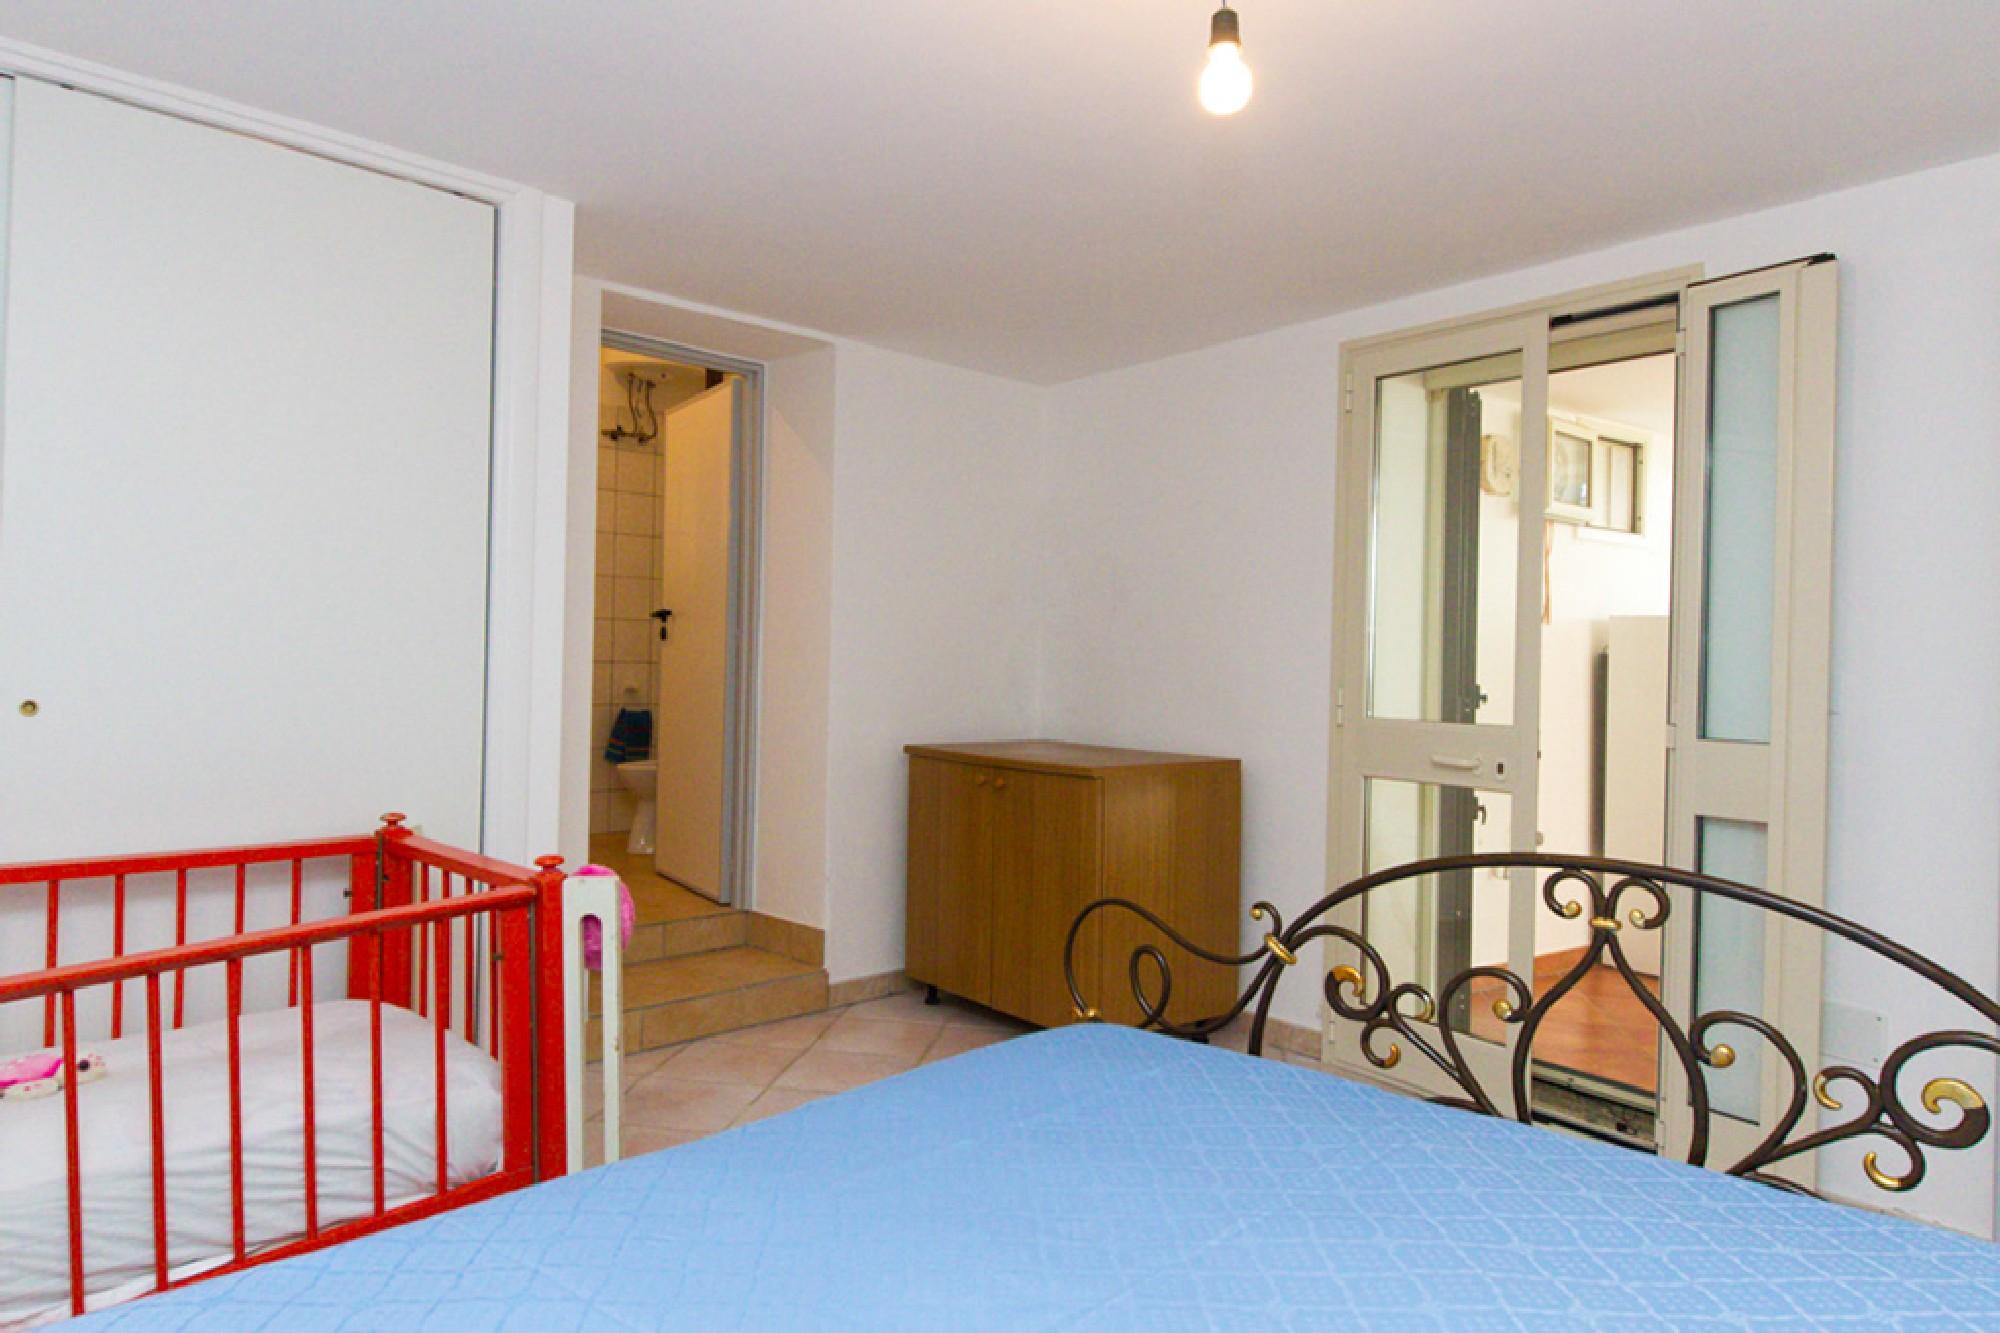 Apartment Apt Porticato 2 - Cantoru photo 24289670